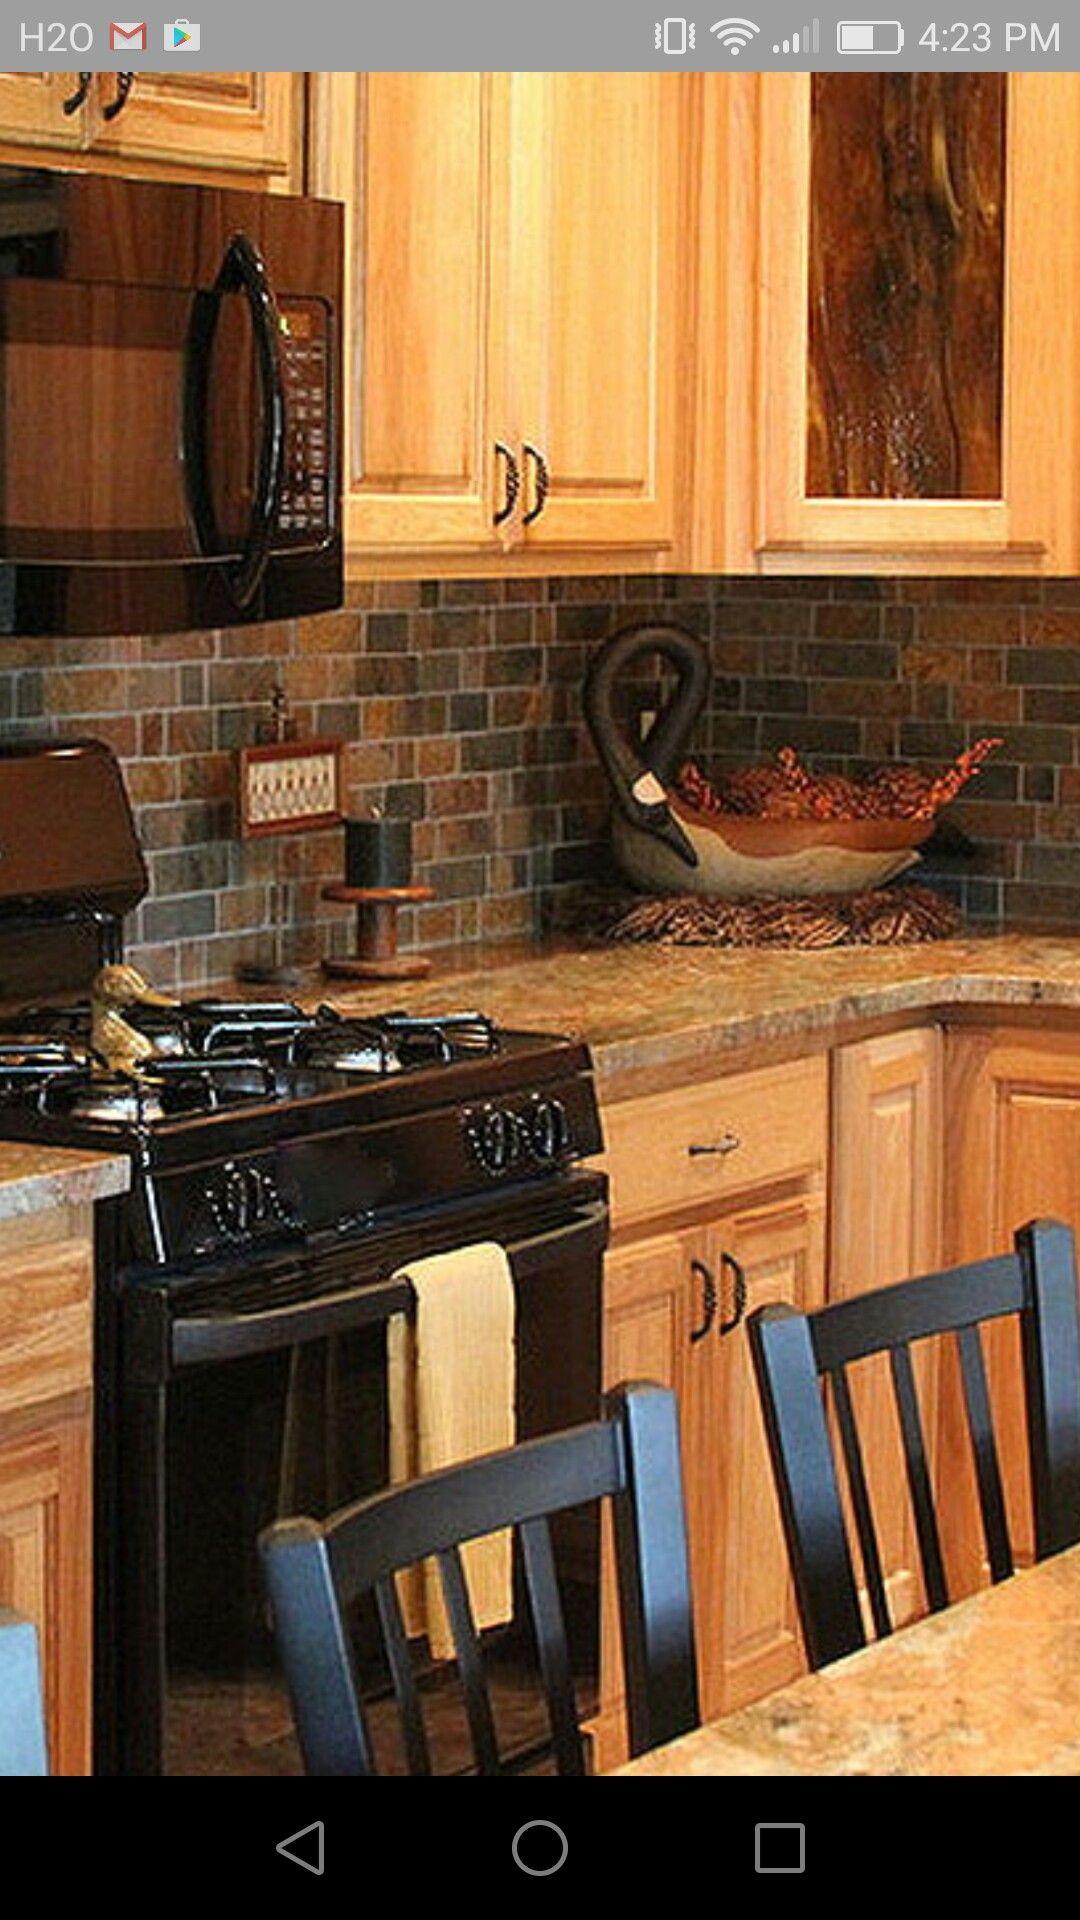 Oak Cabinets Black Appliances And Backsplash Rustic Kitchen